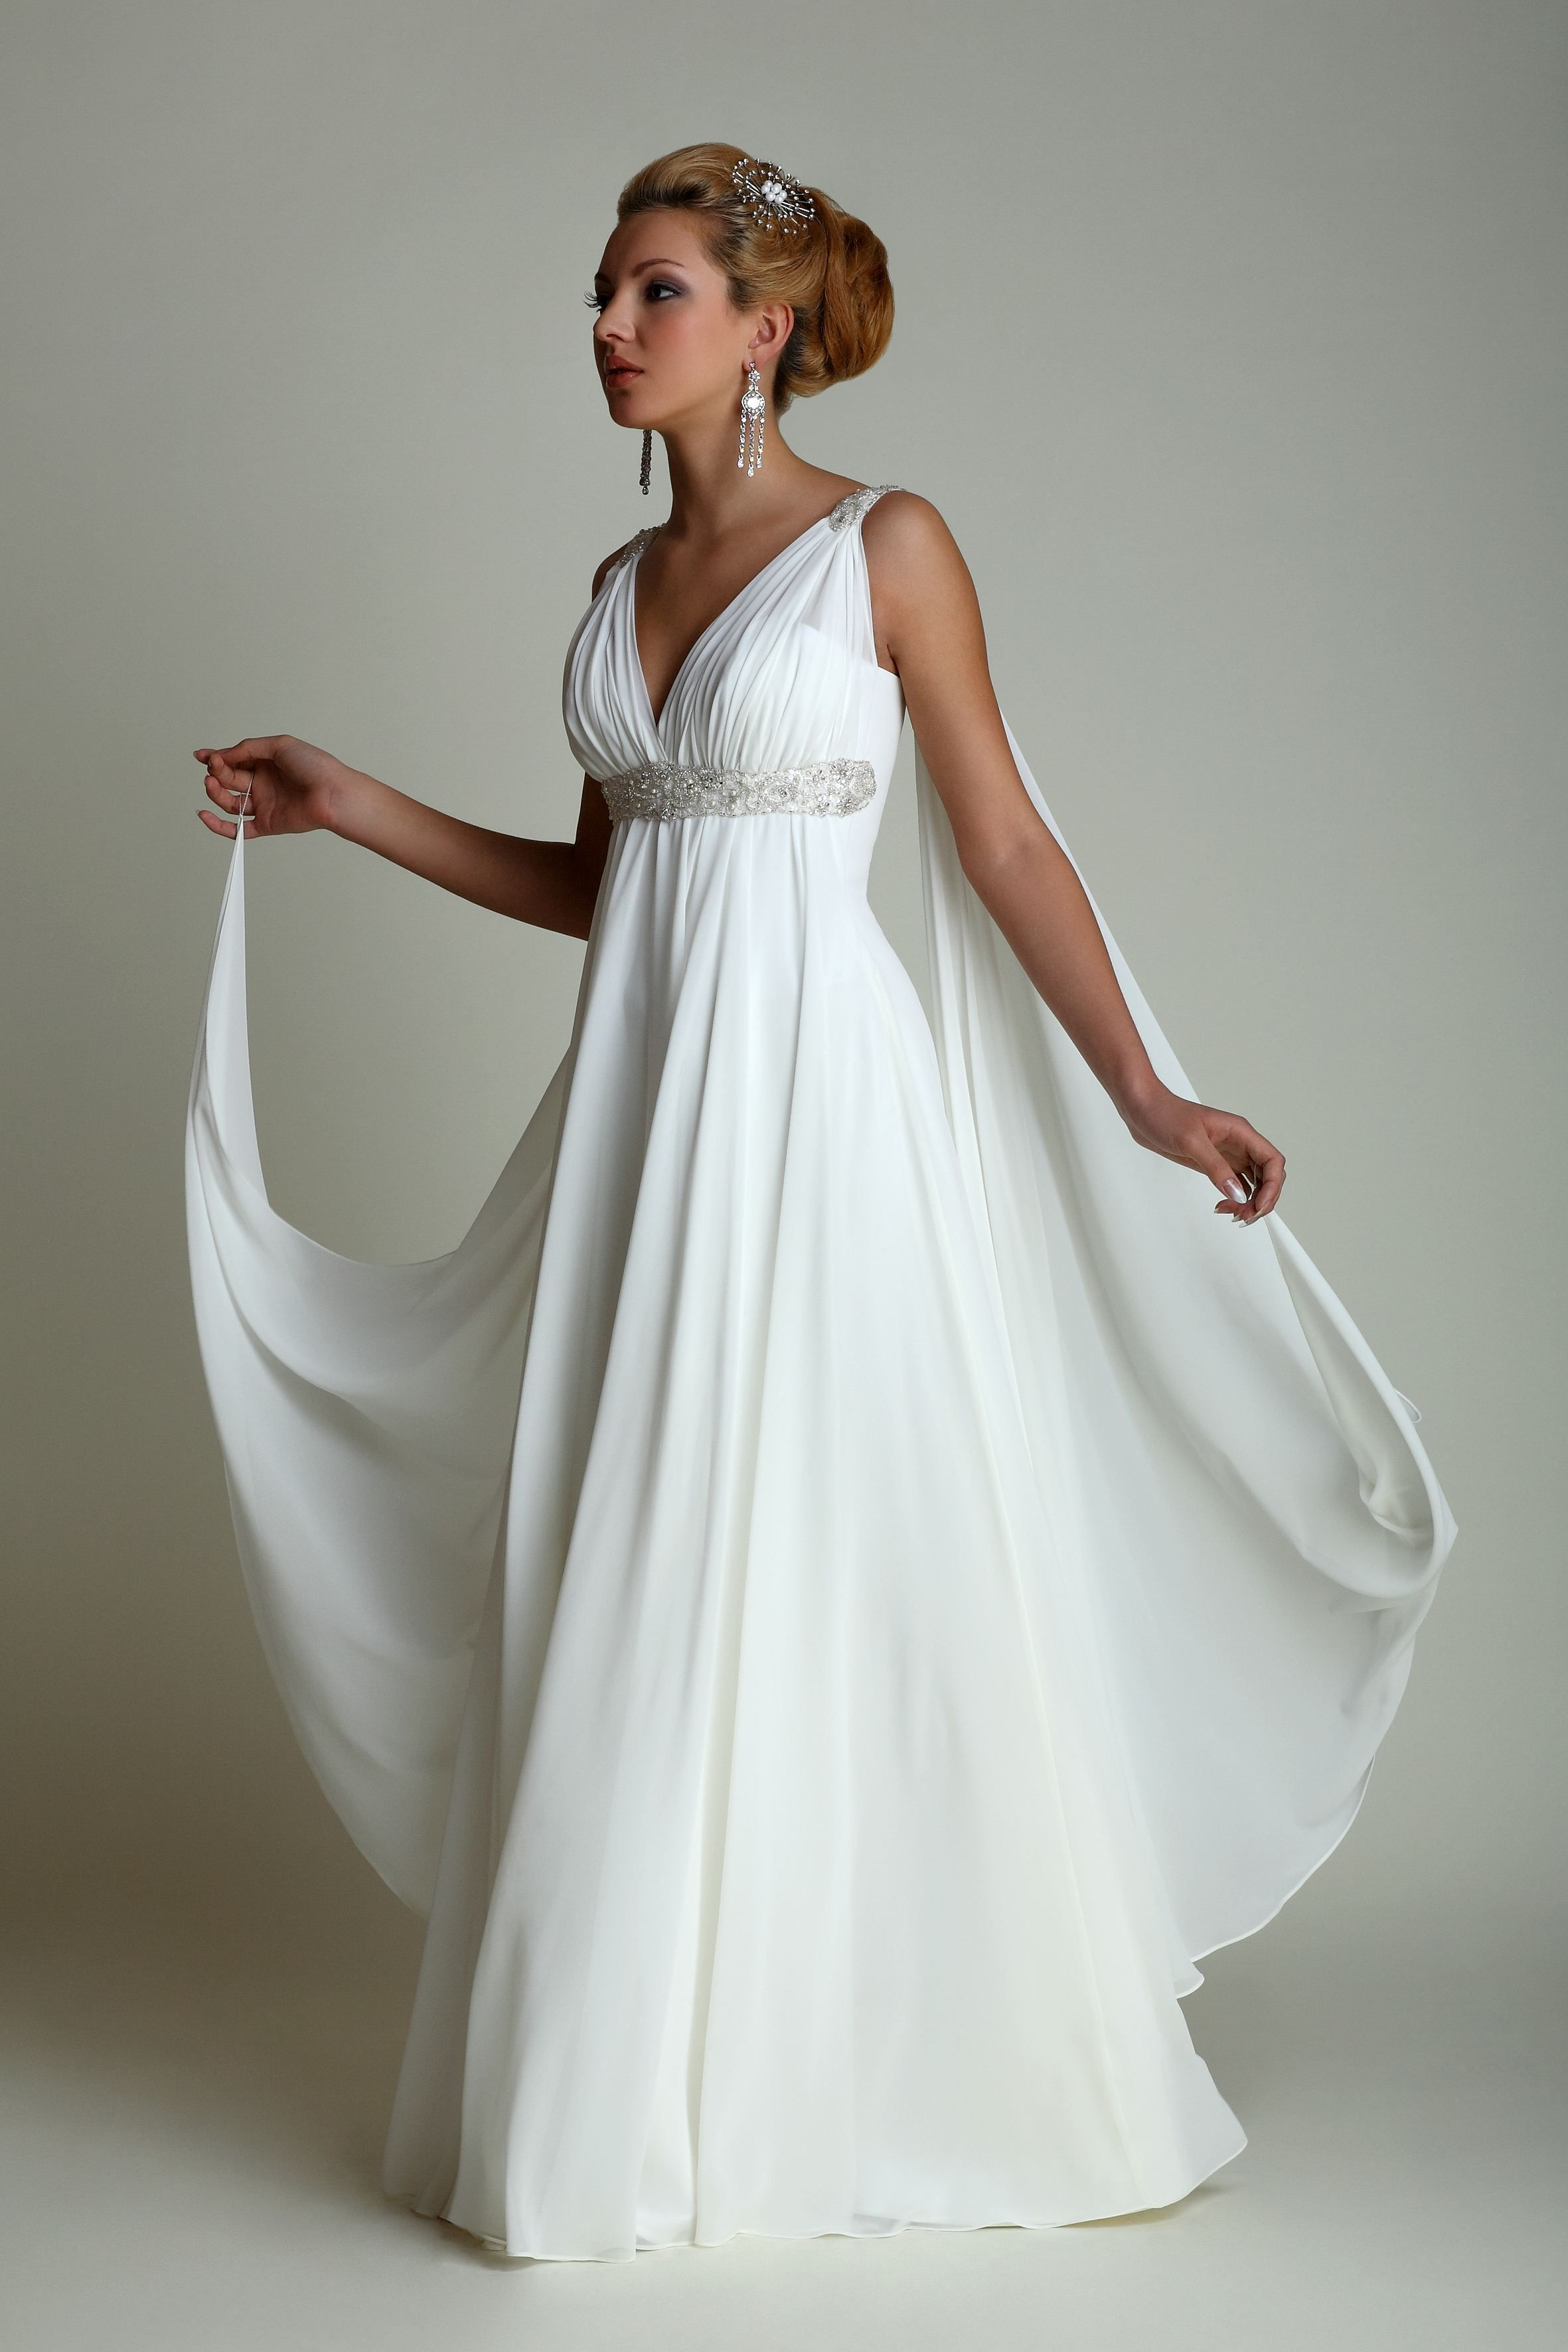 Greek style wedding dress. Really like this dress, but ...